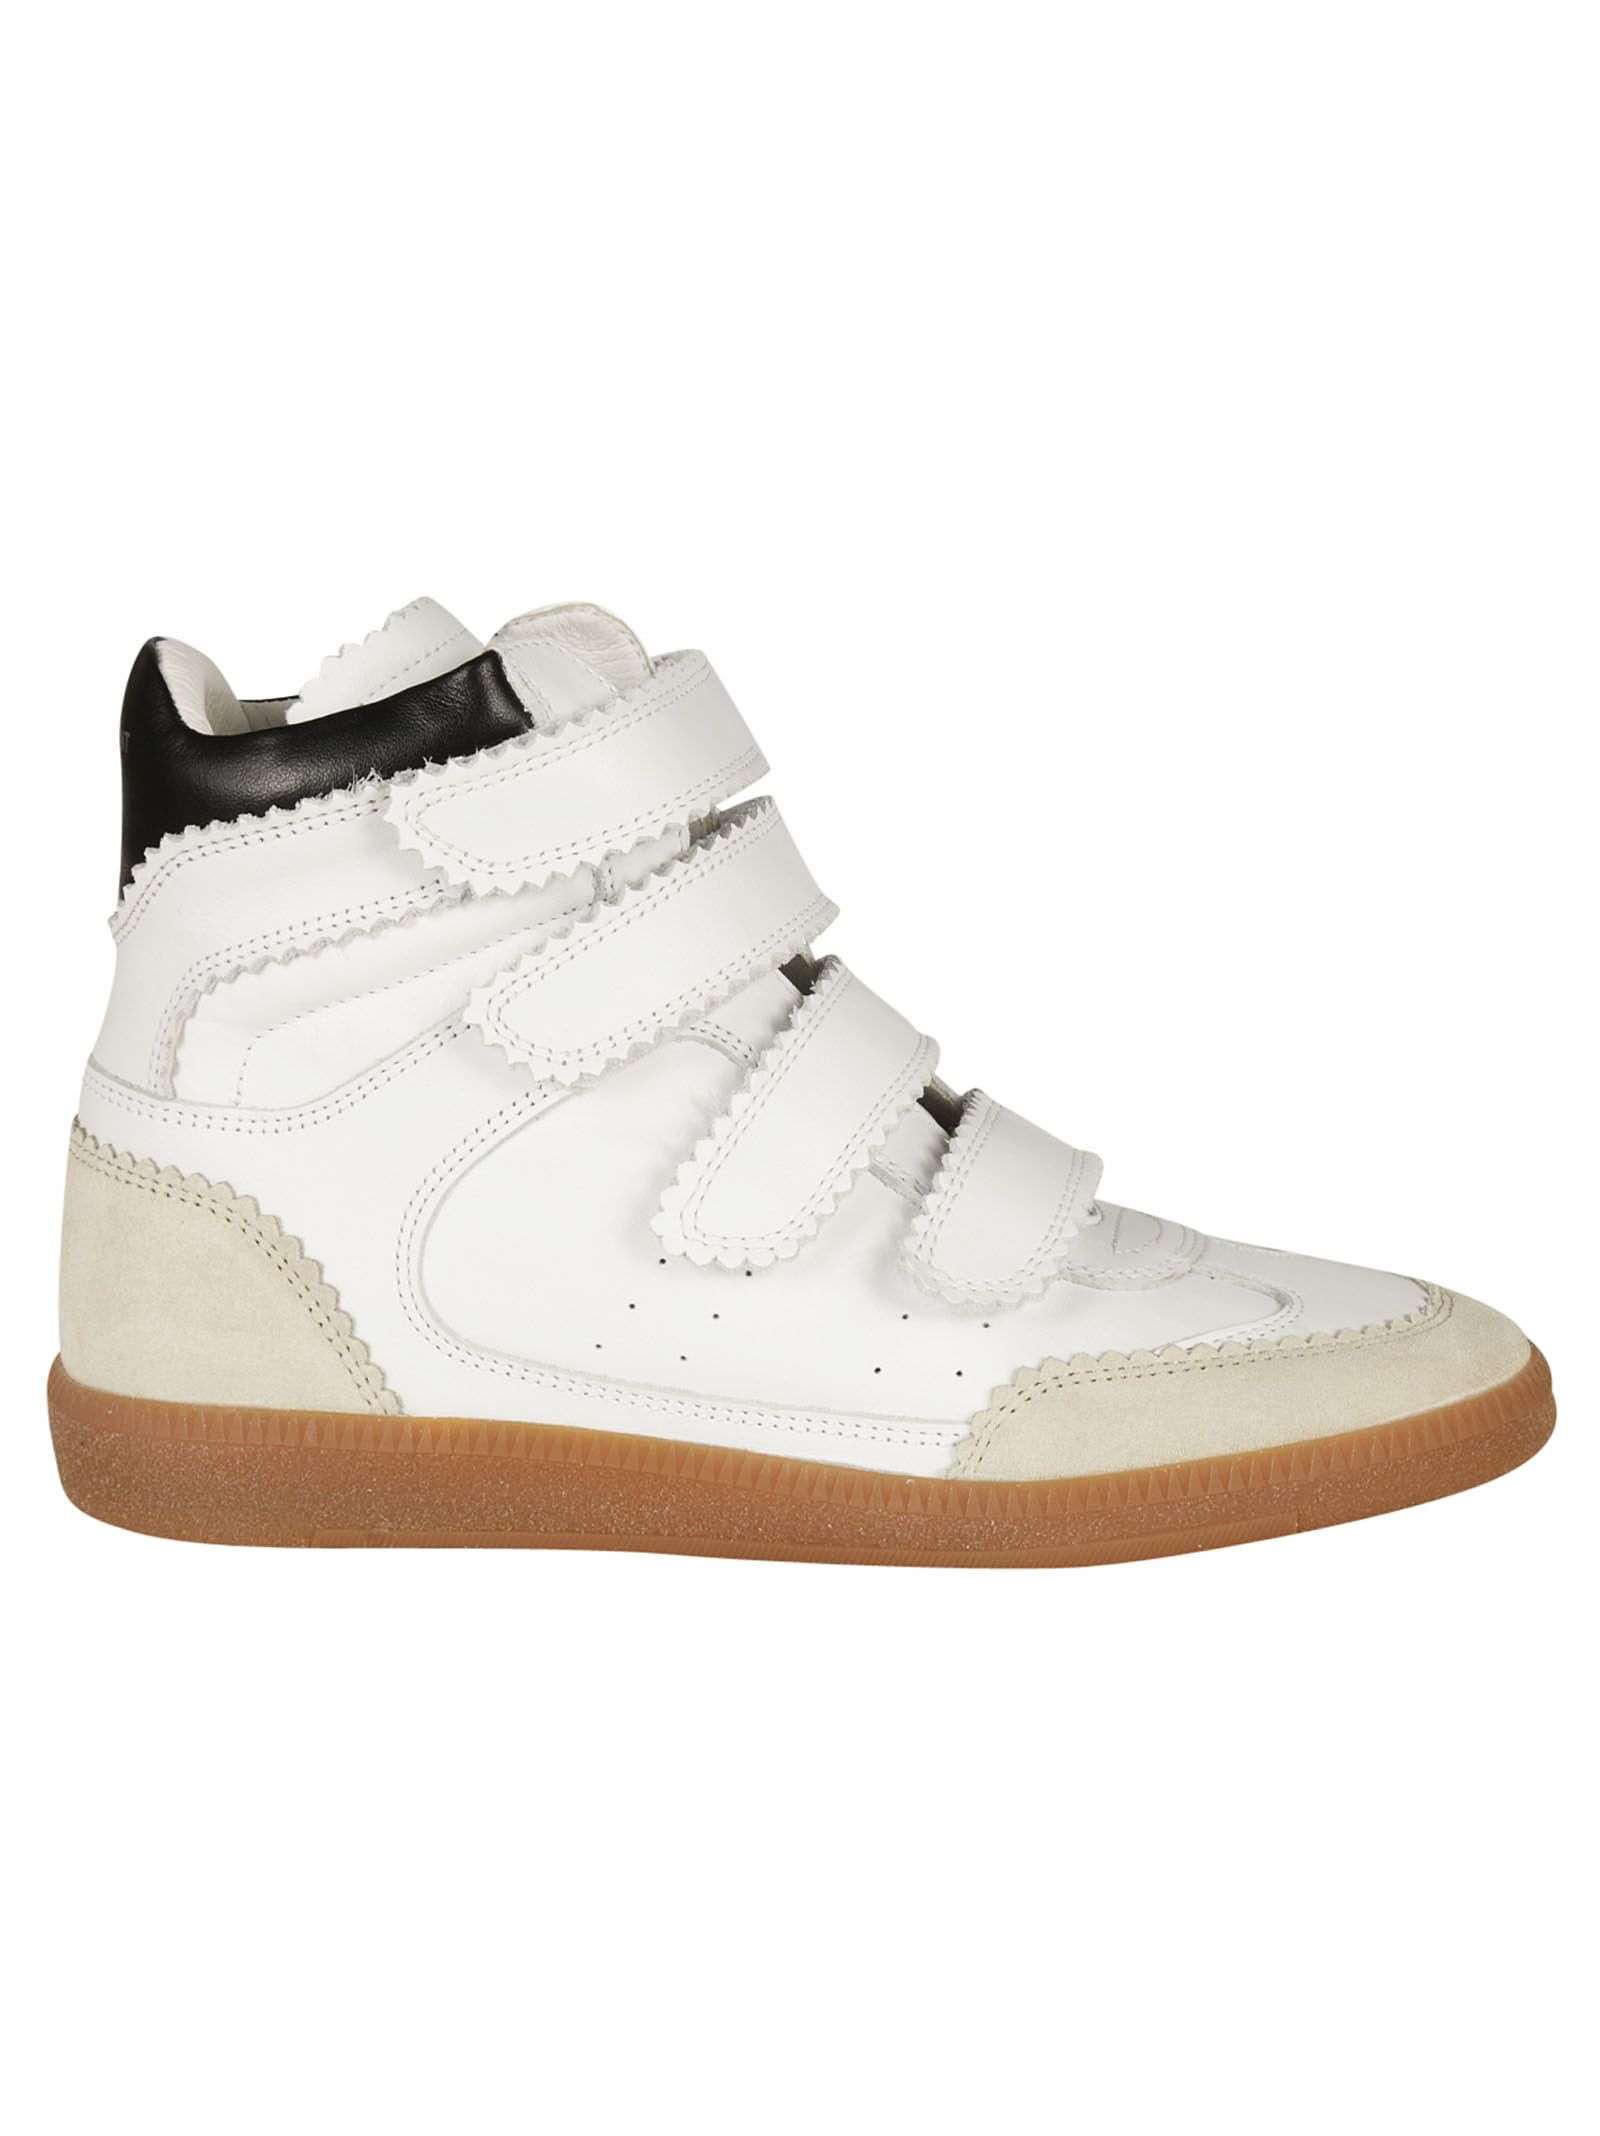 isabel marant isabel marant bilsy hi top sneakers white women 39 s sneakers italist. Black Bedroom Furniture Sets. Home Design Ideas